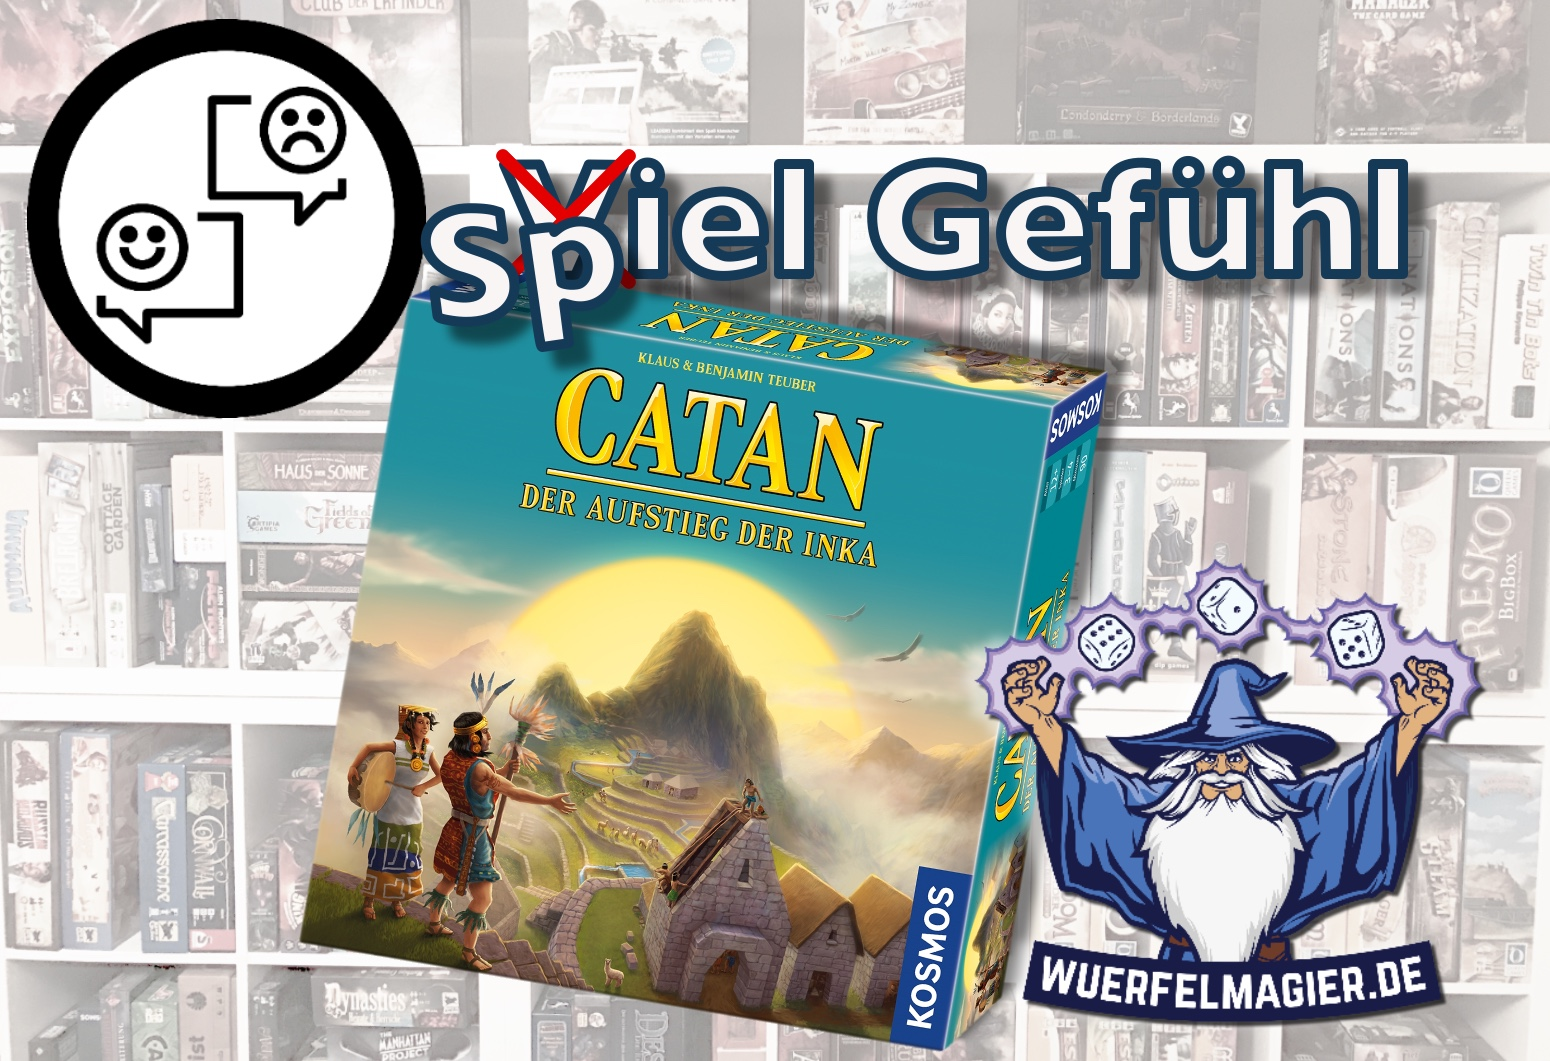 Rezension Spiel Gefühl Würfelmagier Wuerfelmagier Catan Aufstieg der Inka